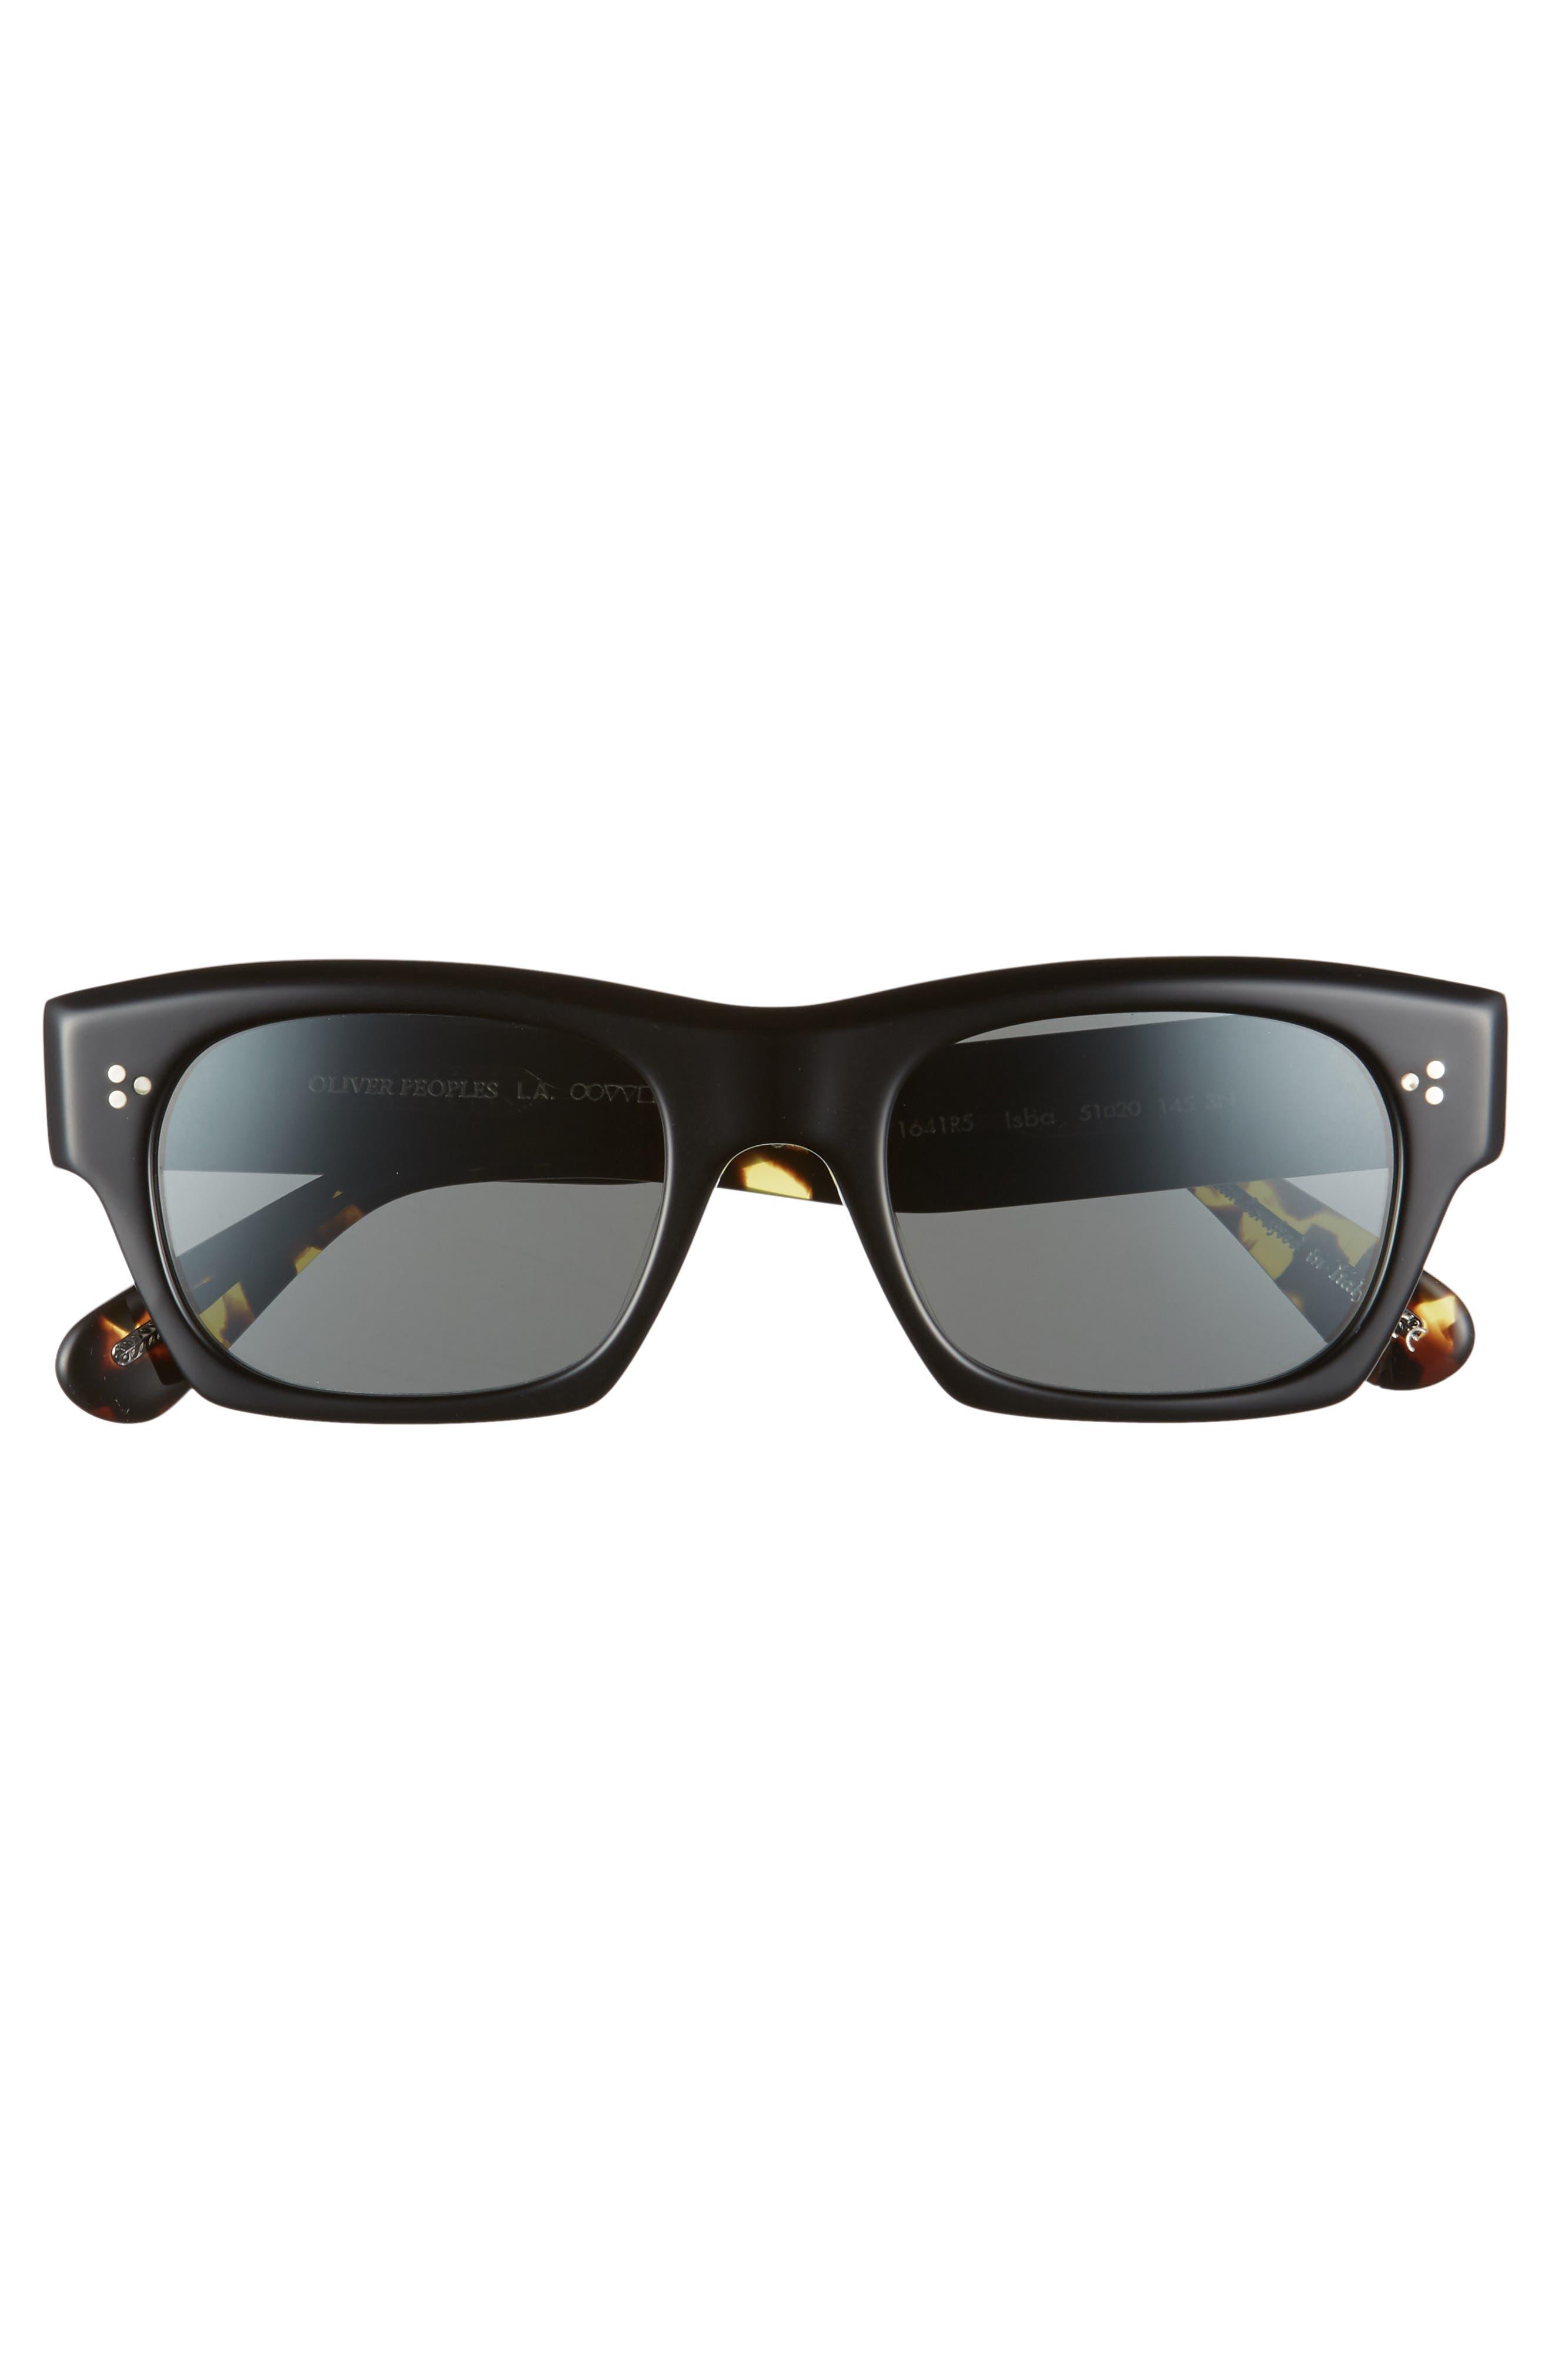 Isba 51mm Sunglasses,                             Alternate thumbnail 3, color,                             BLACK